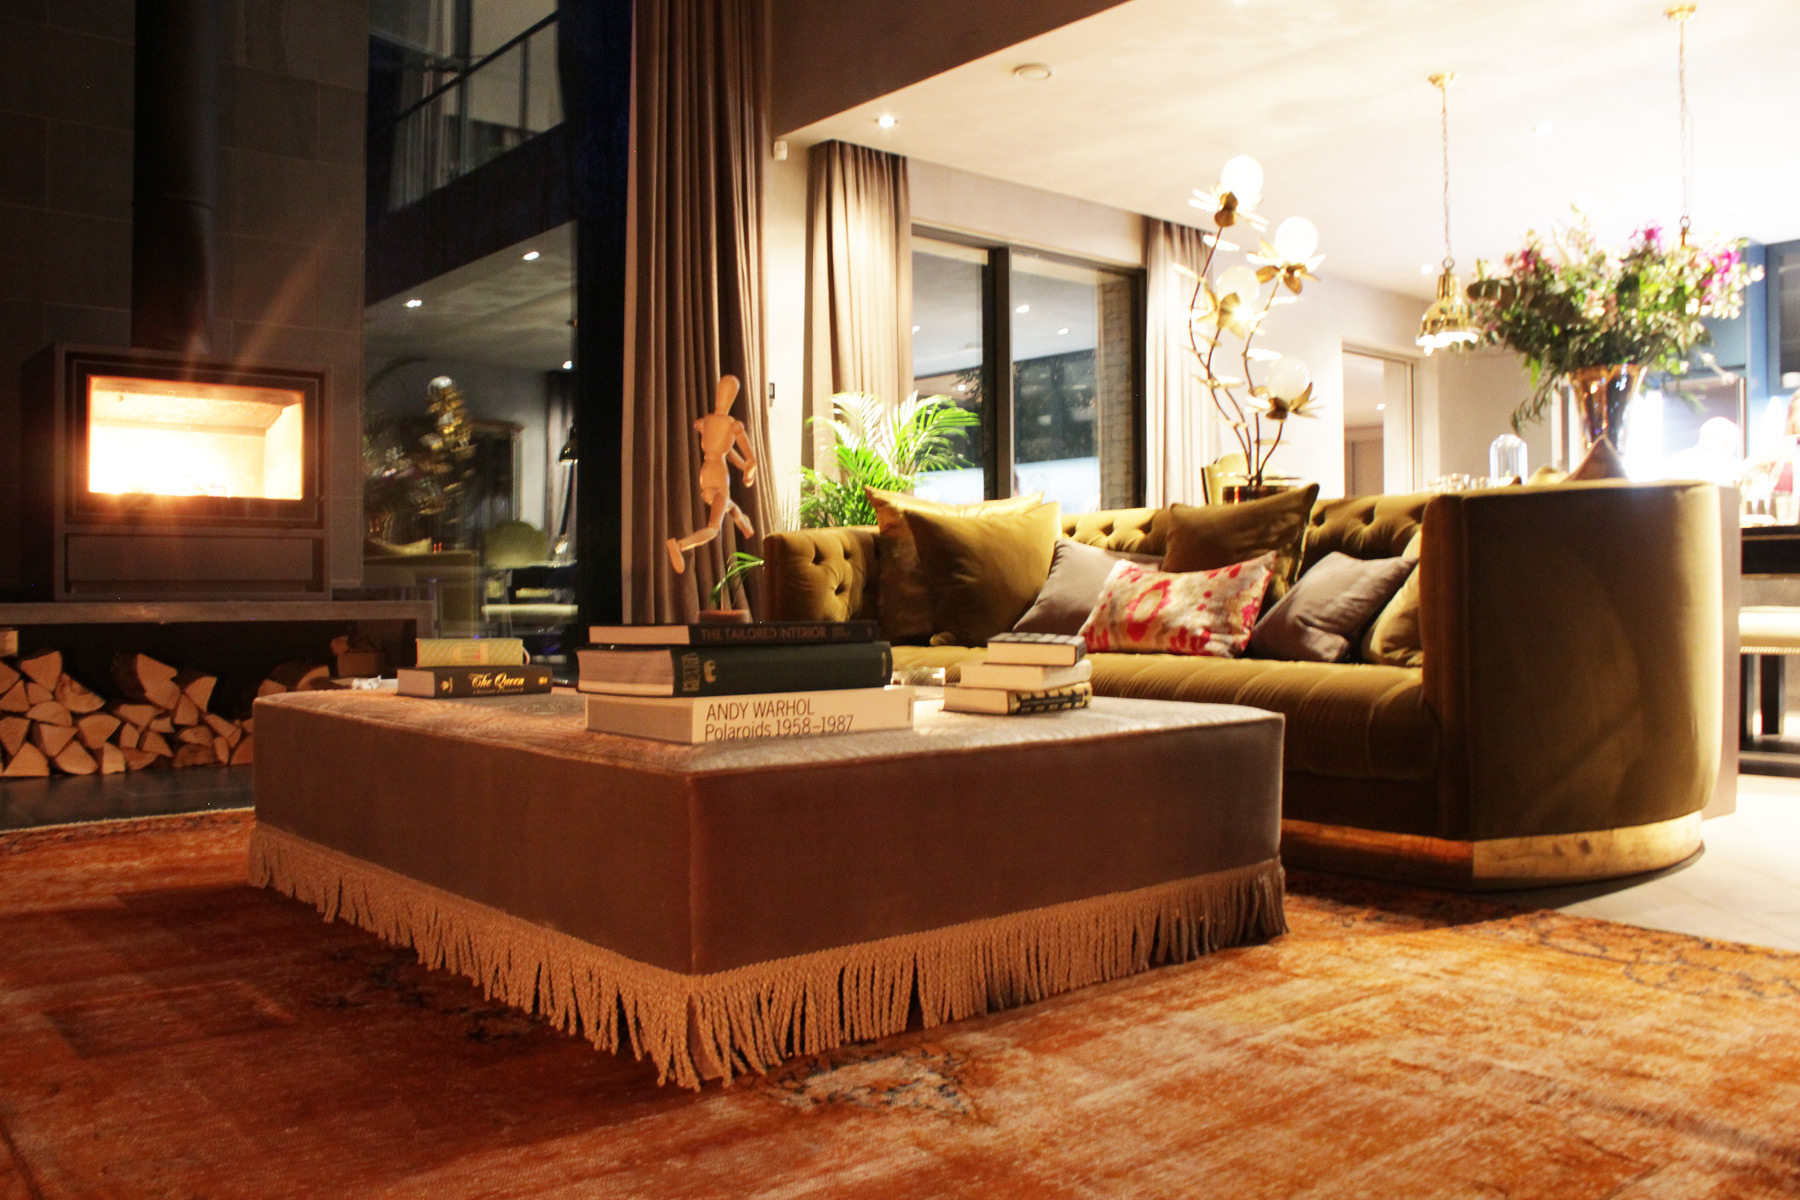 The-Lakes-by-Yoo-barnhouse-living-room